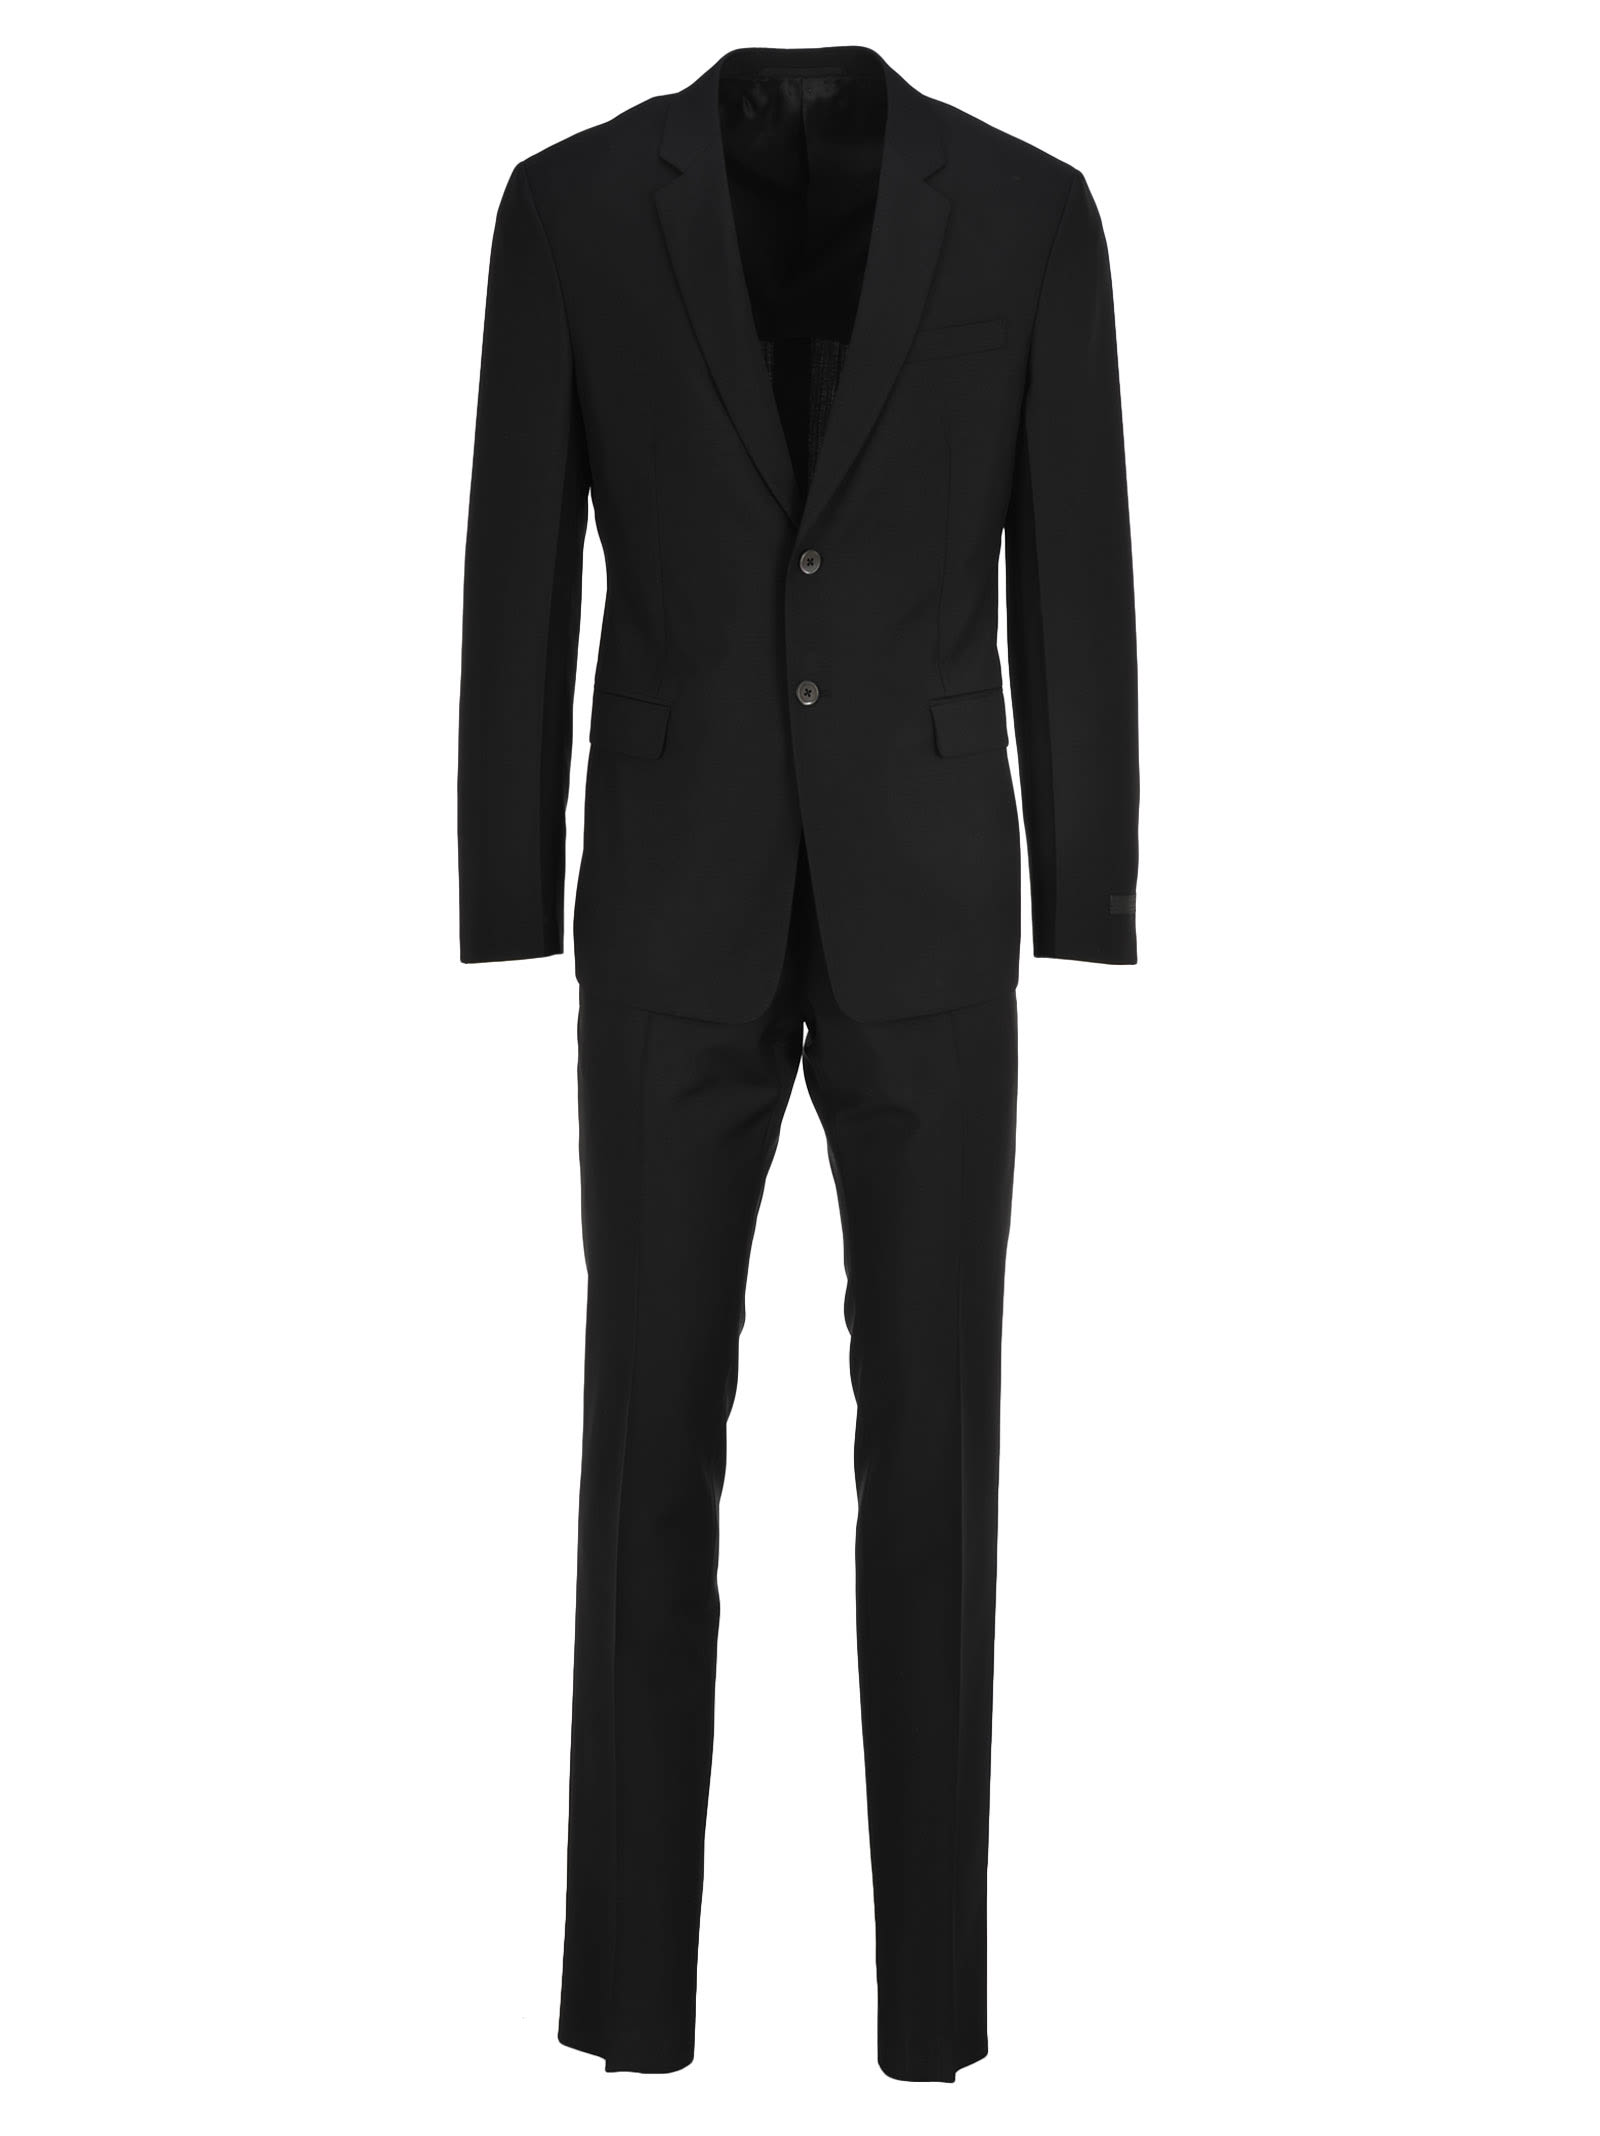 Prada Prada Classic Two-piece Suit